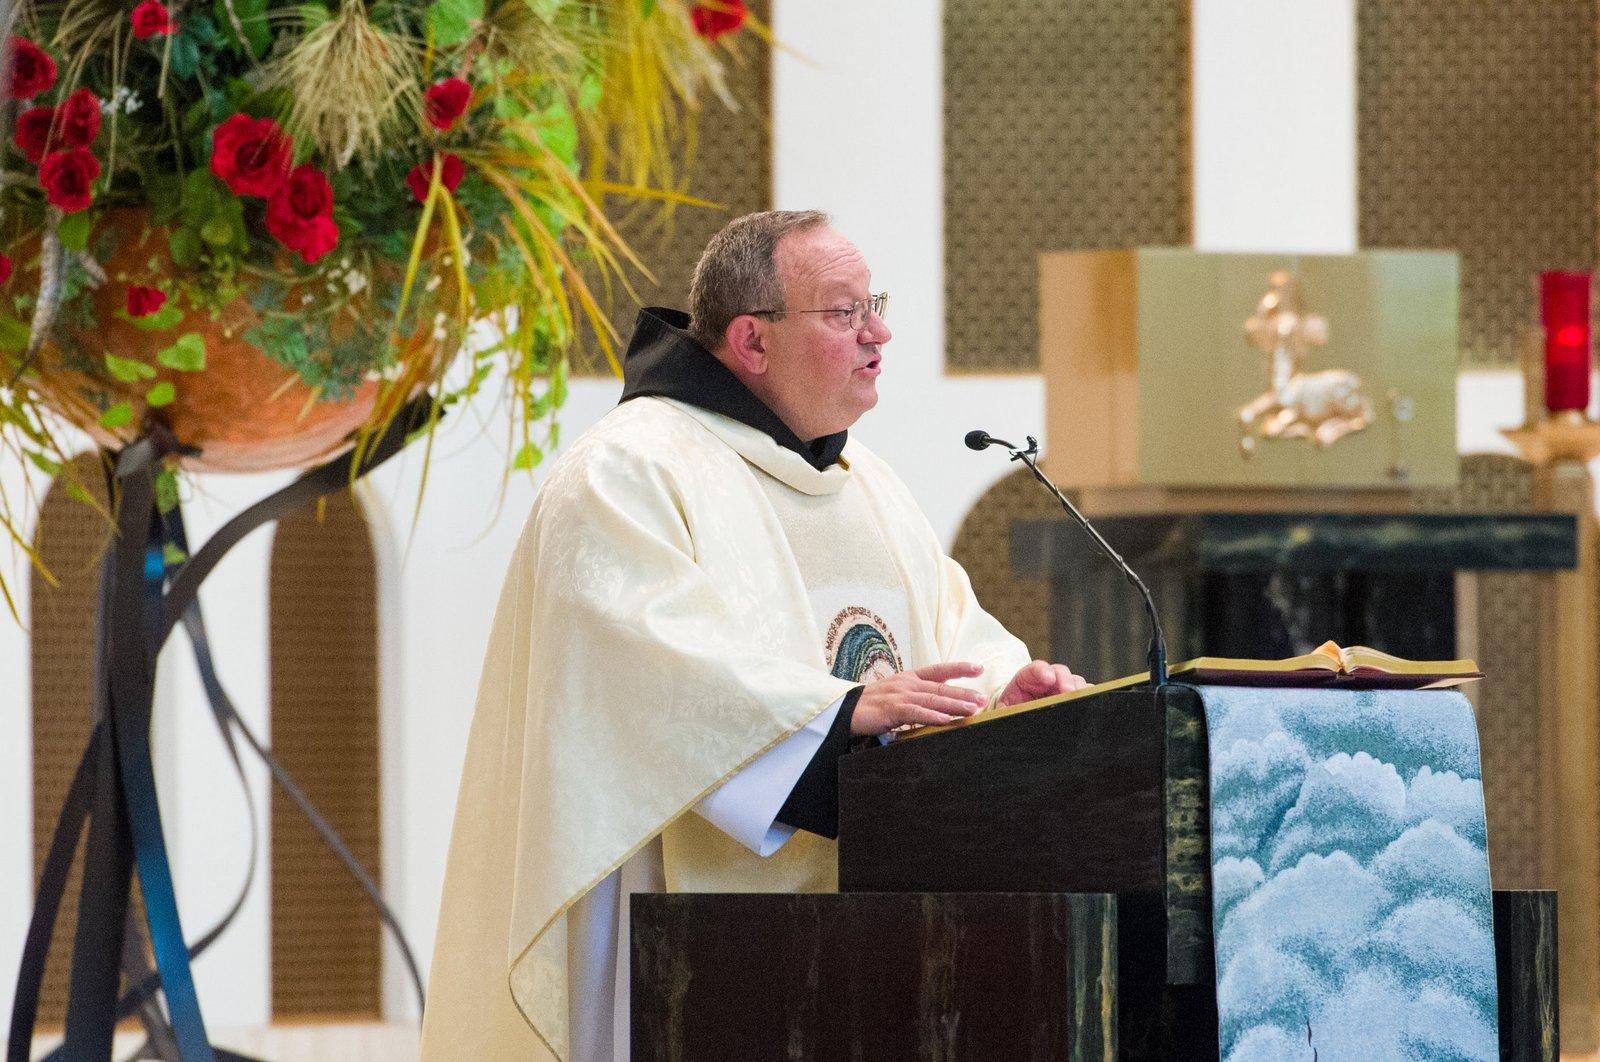 Fr. Bernie Scianna OSA delivers Homily